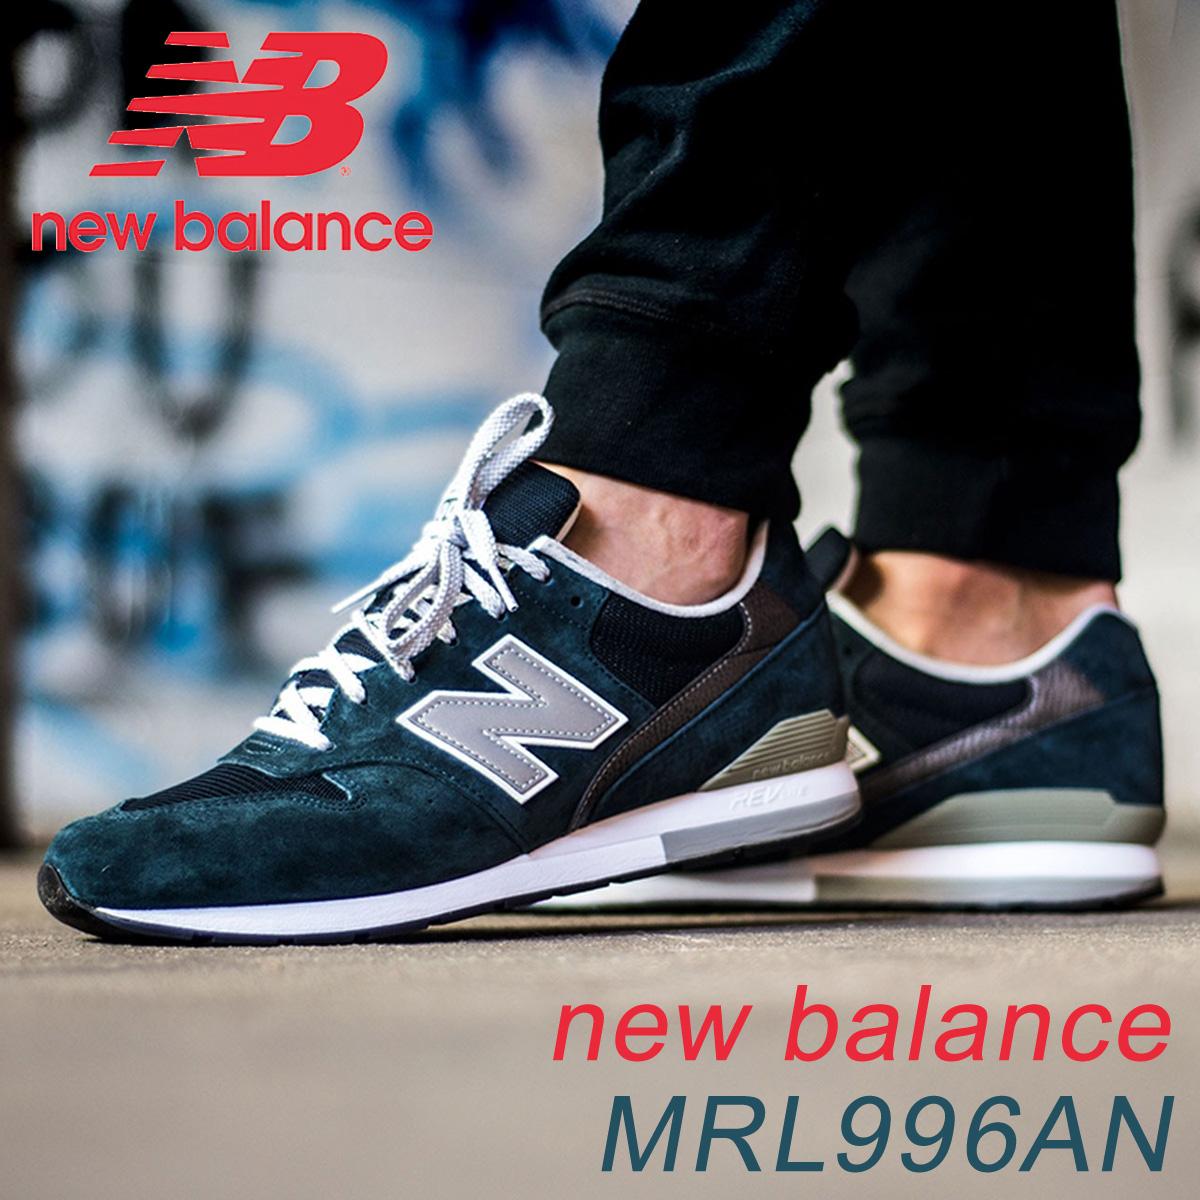 new balance sneakers model 996